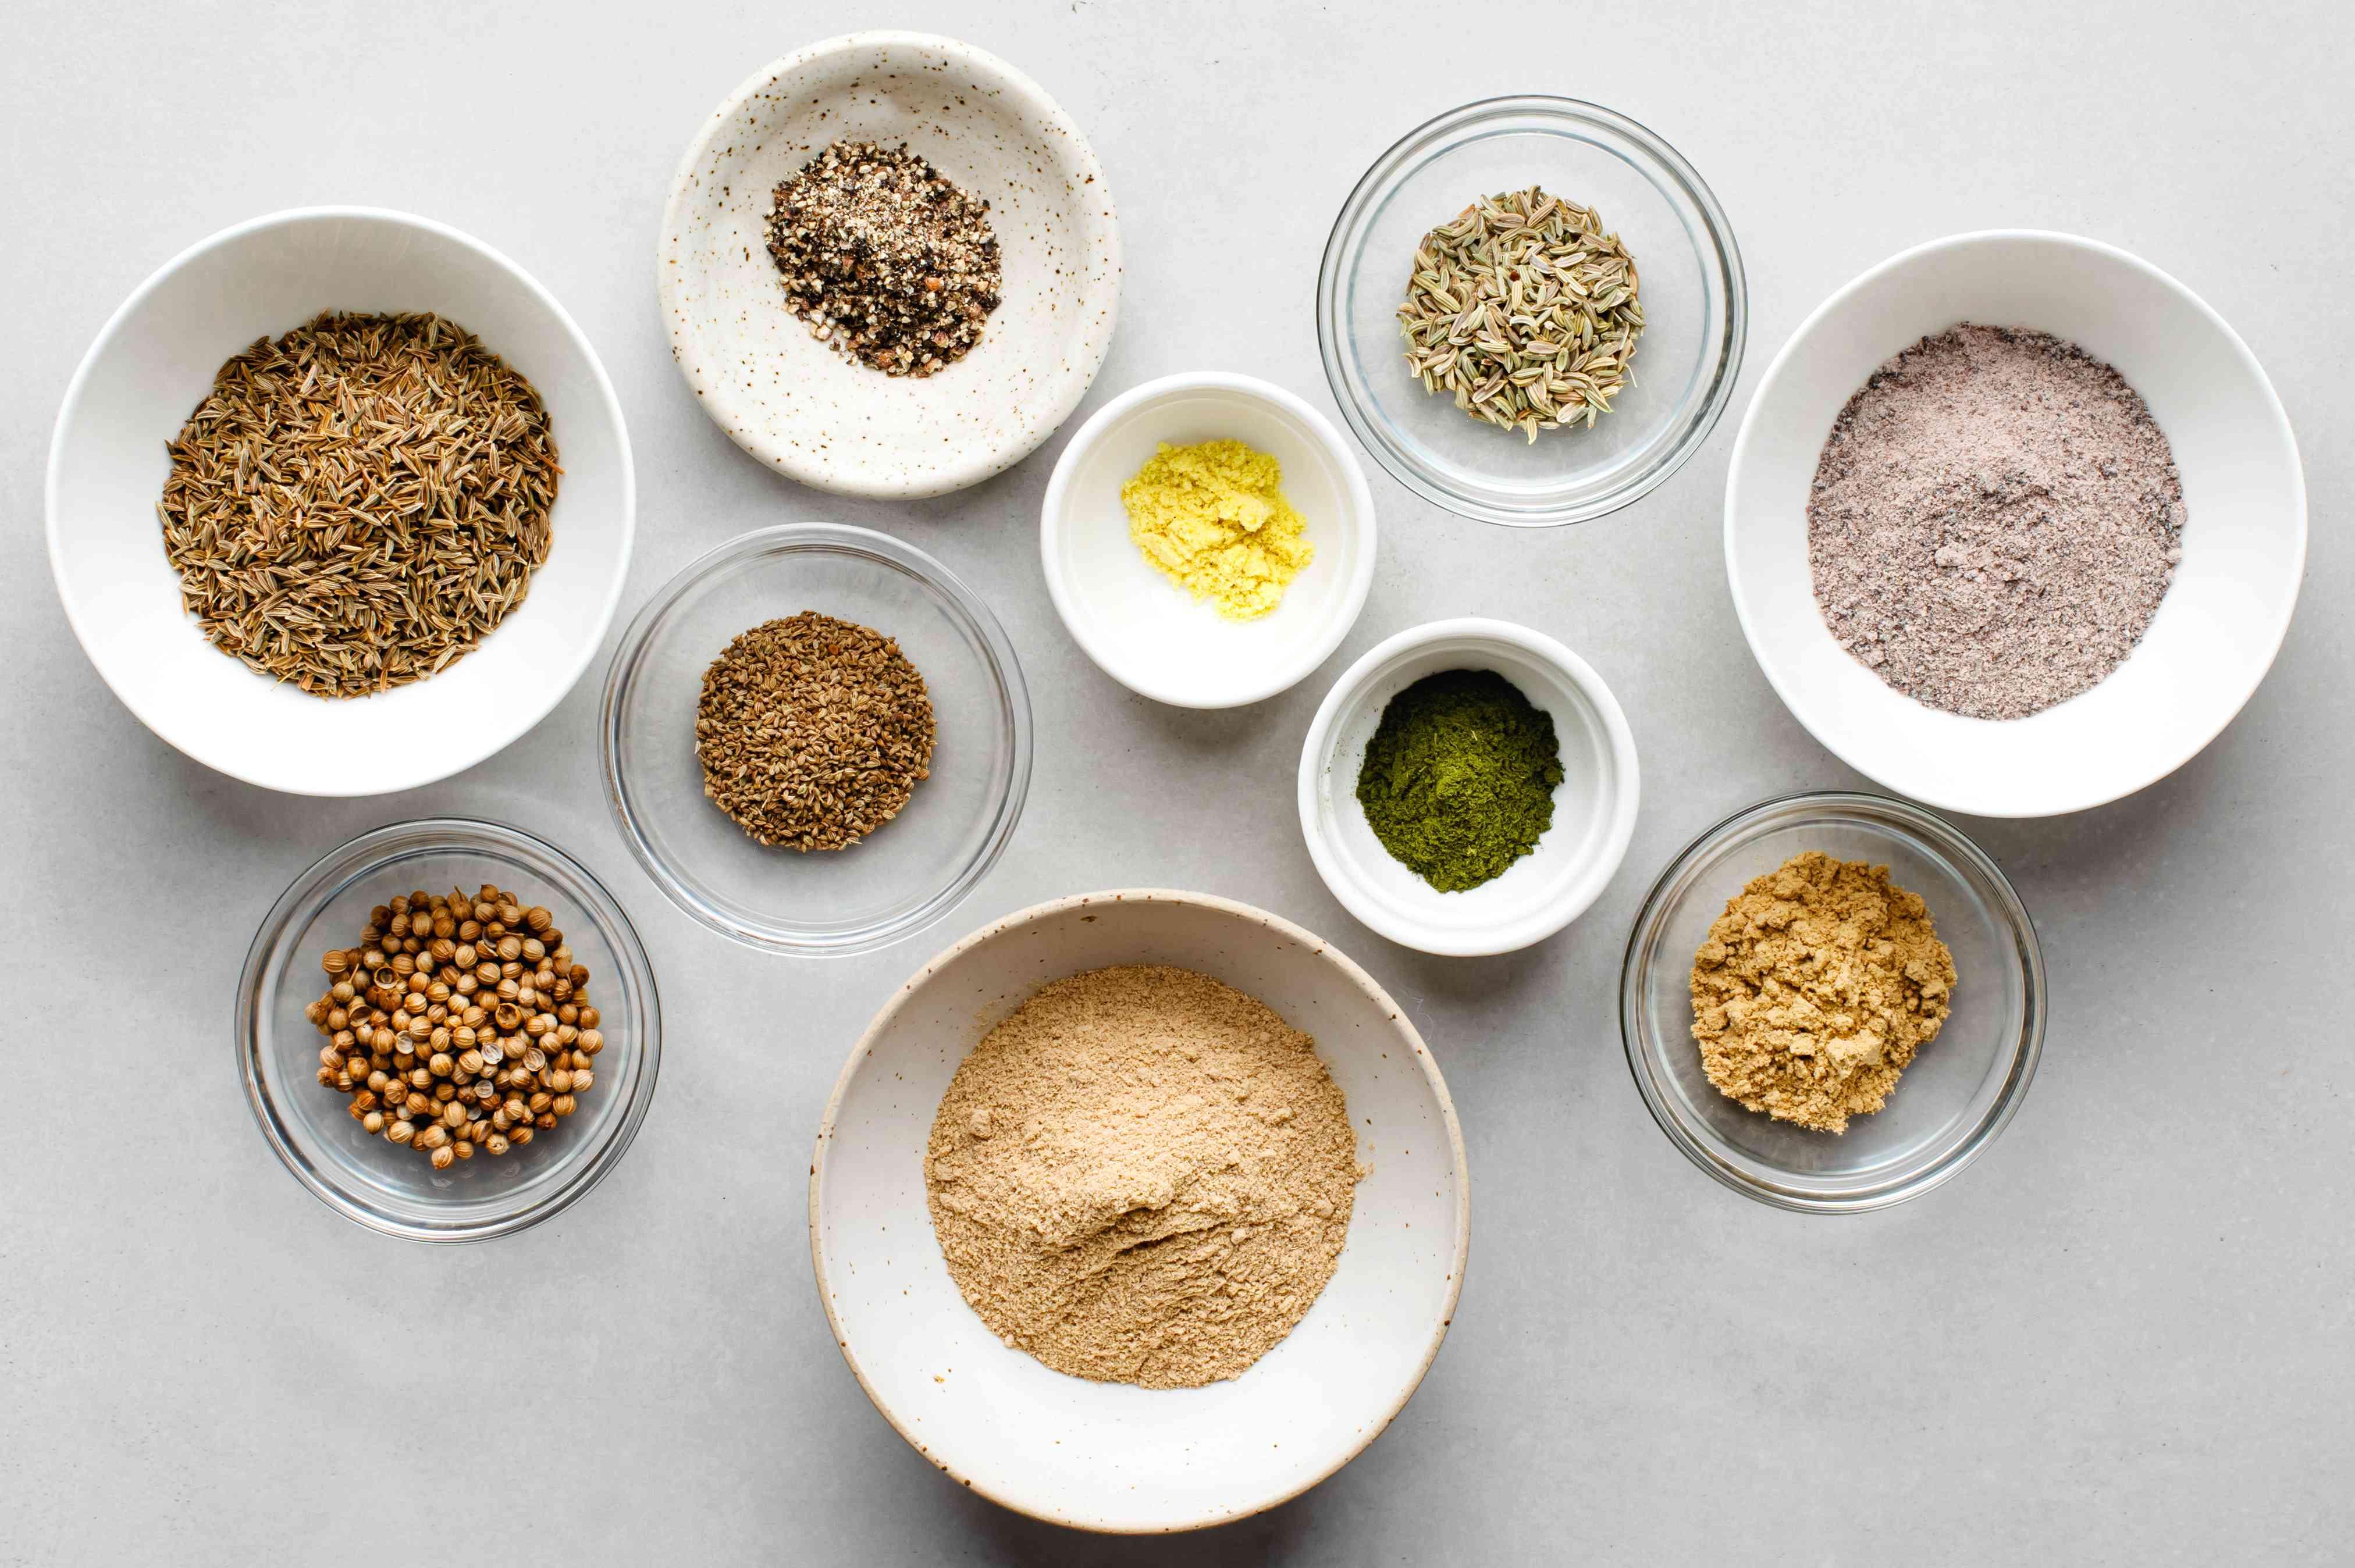 Chaat masala ingredients